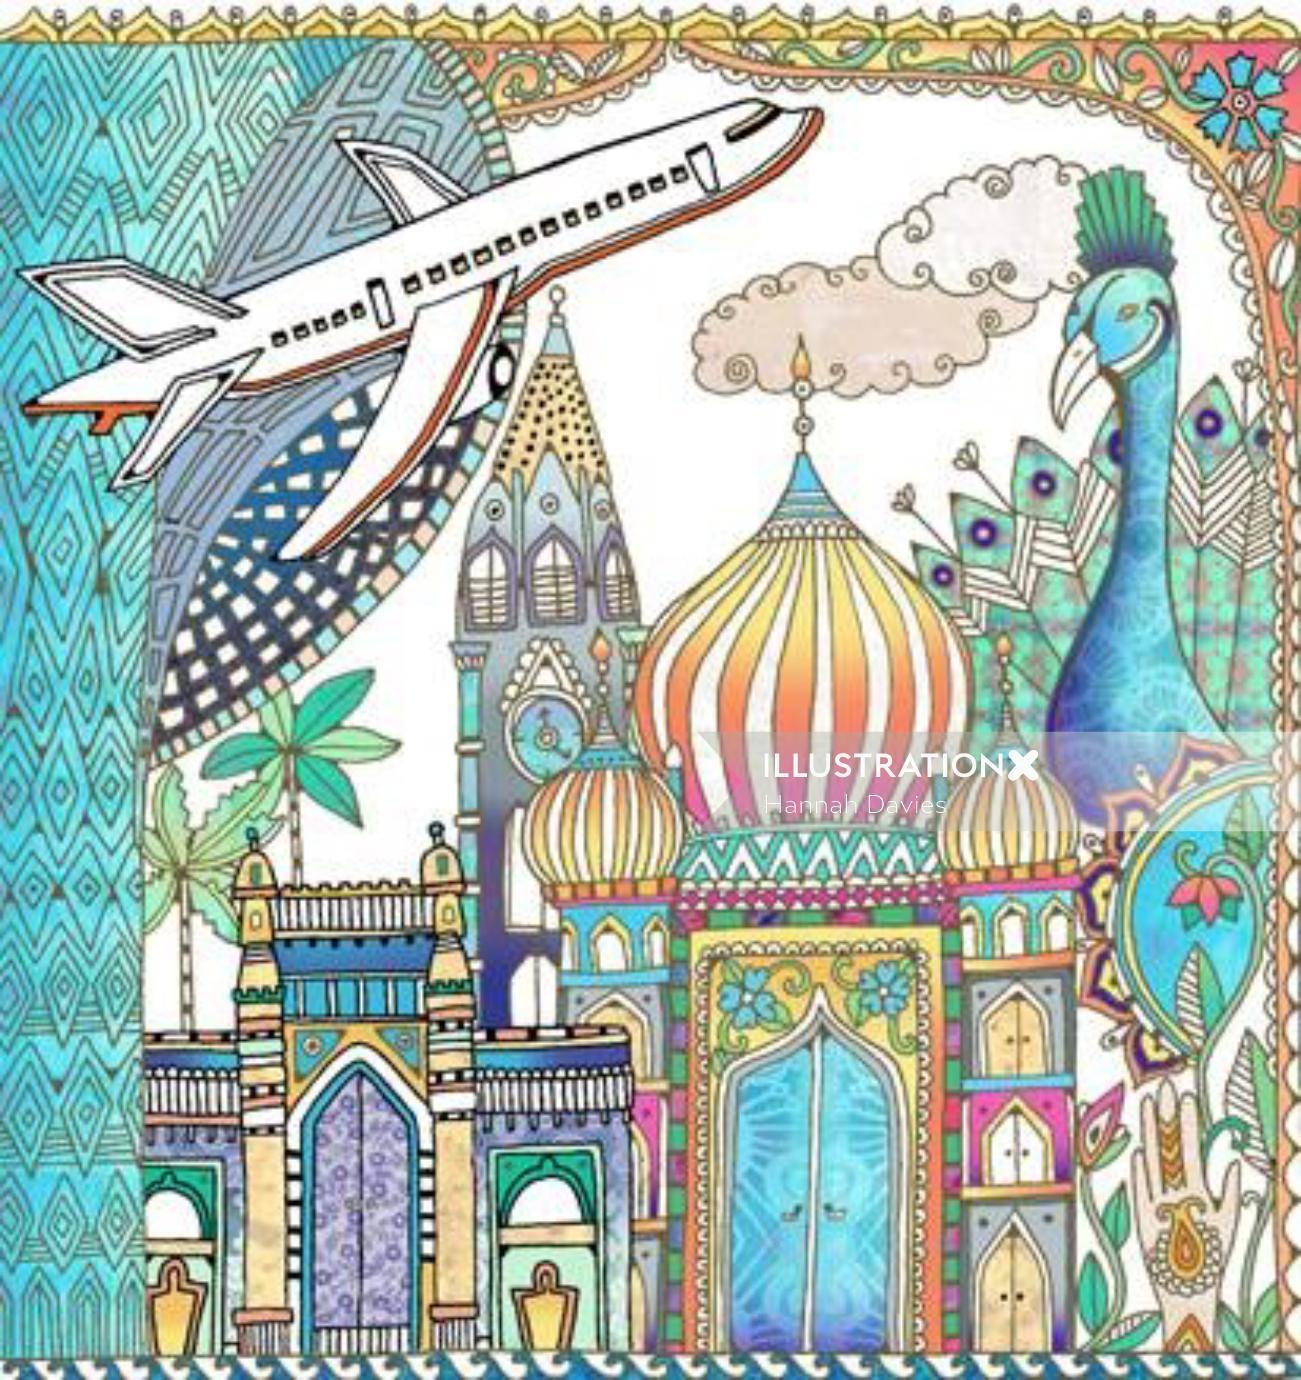 An illustration of mumbai city by Hannah Davies